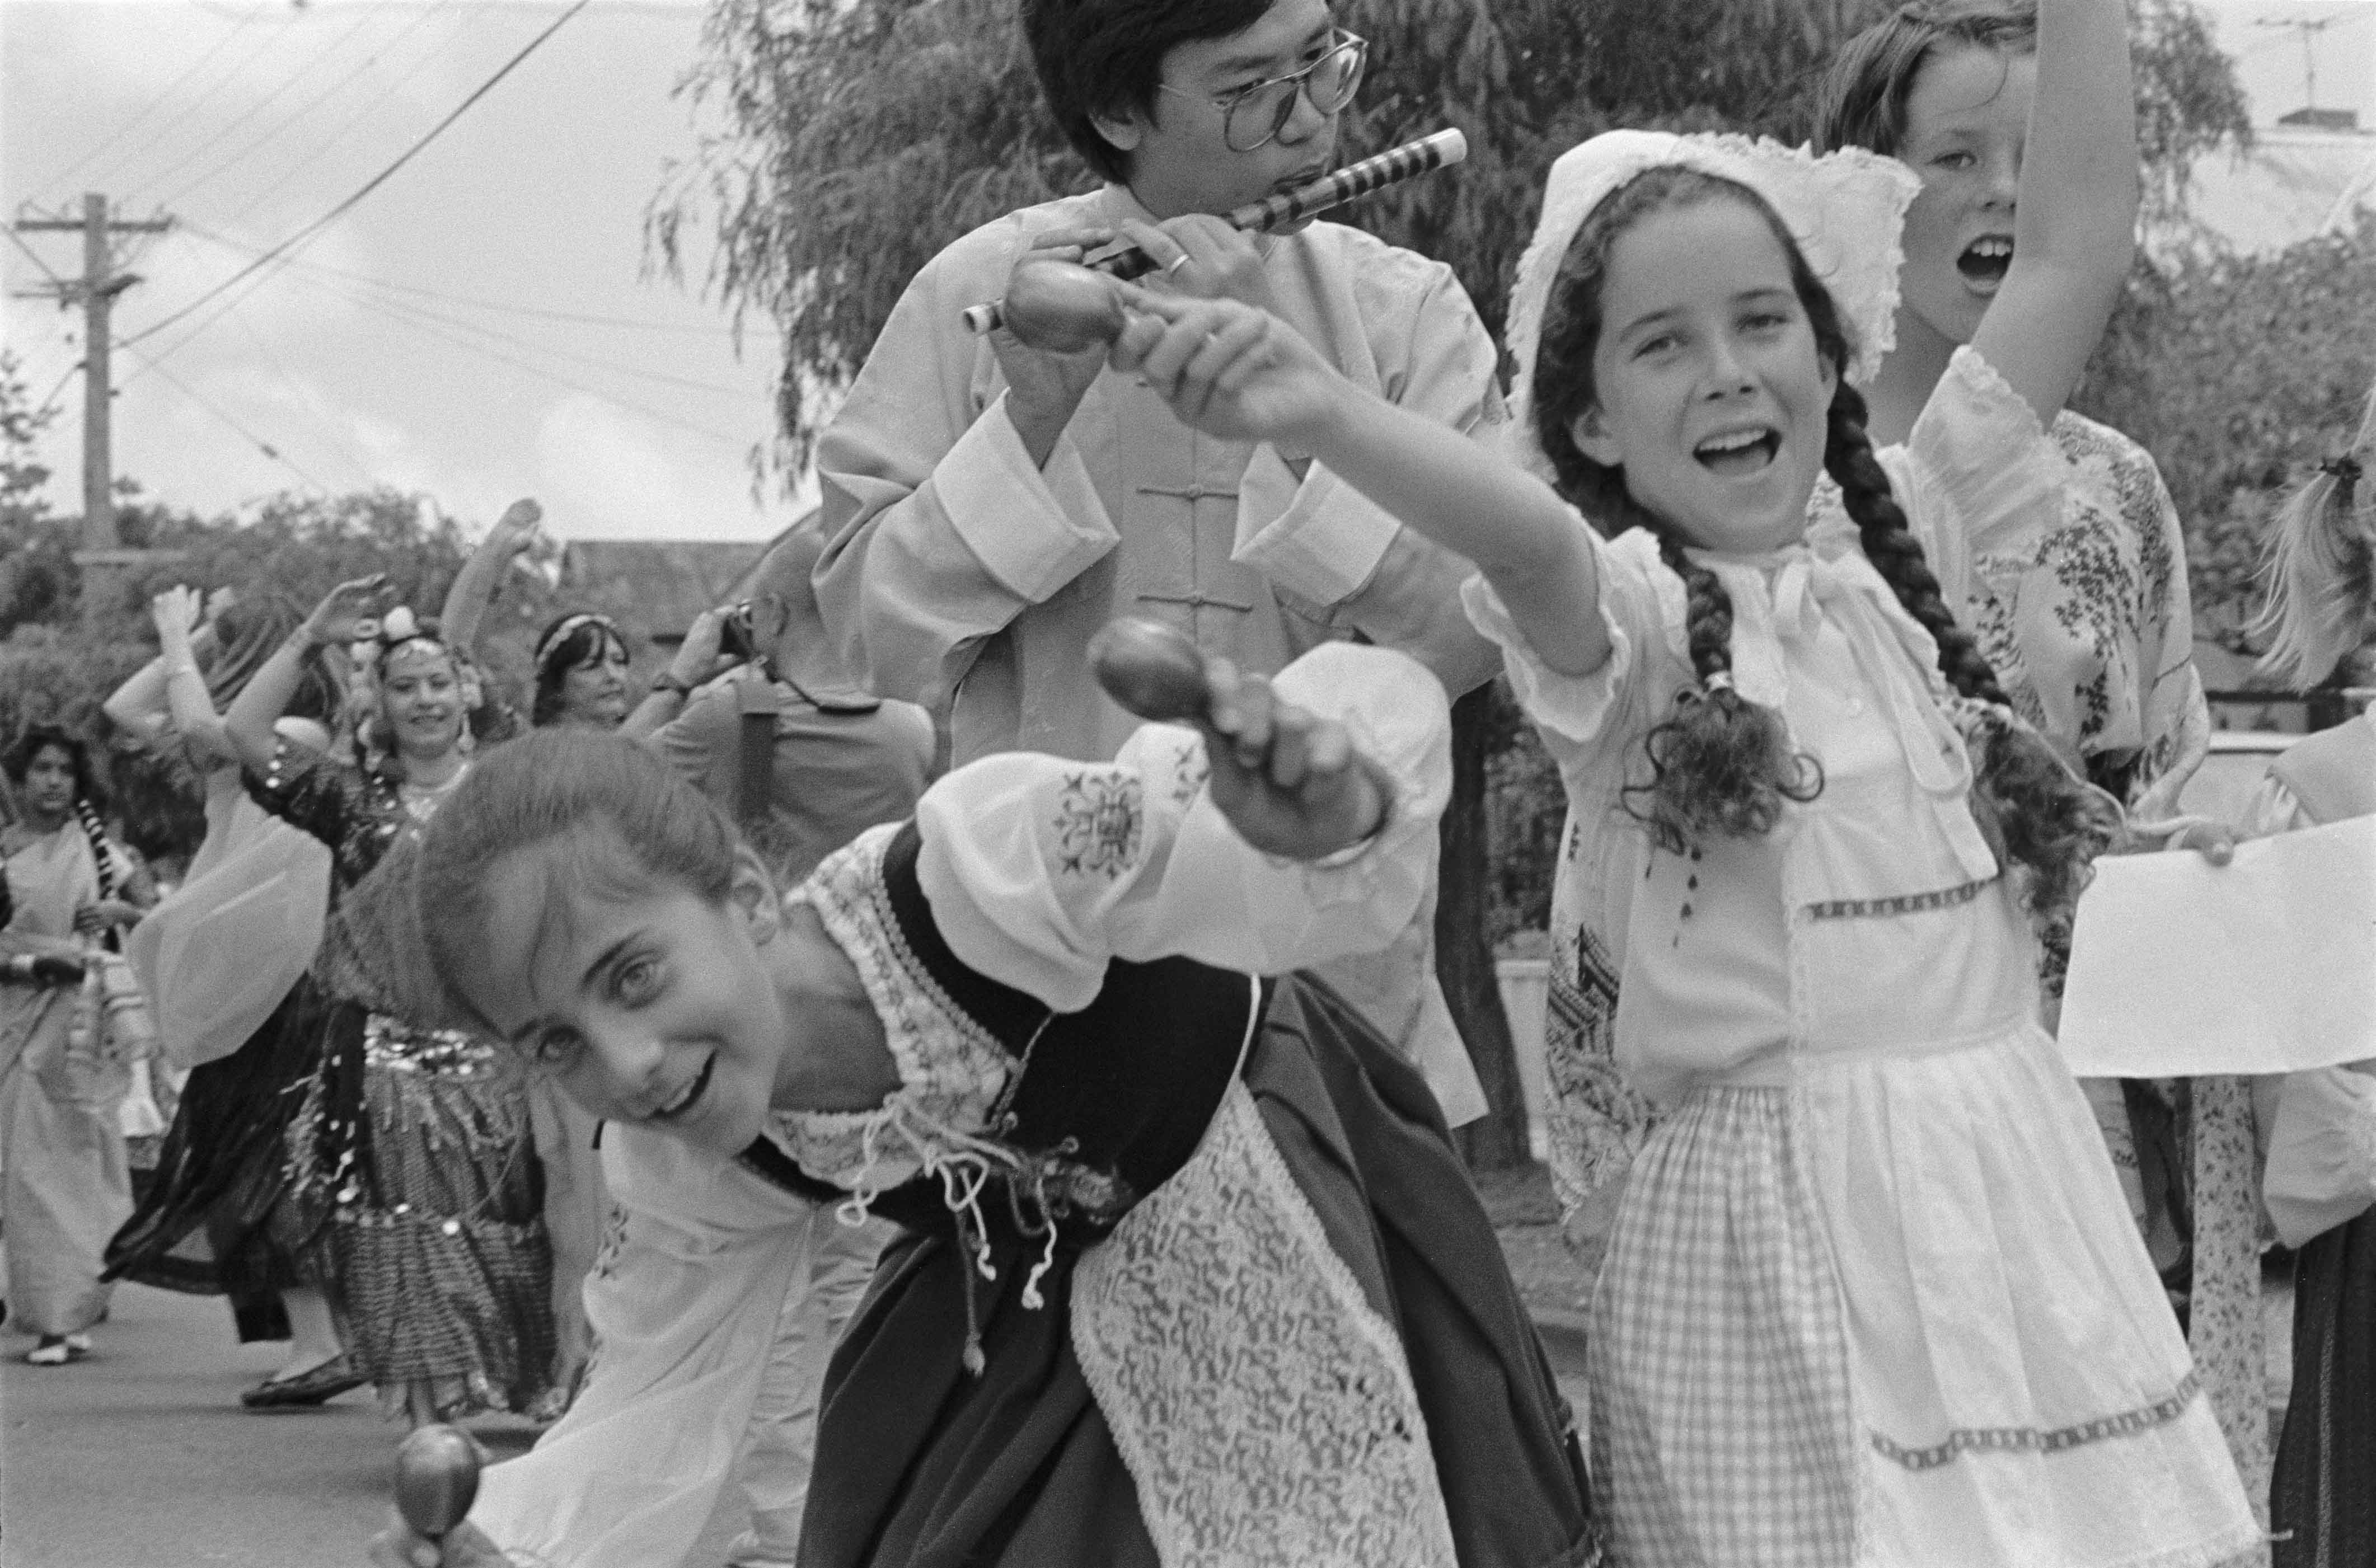 129. Ethnic arts festival, 1985